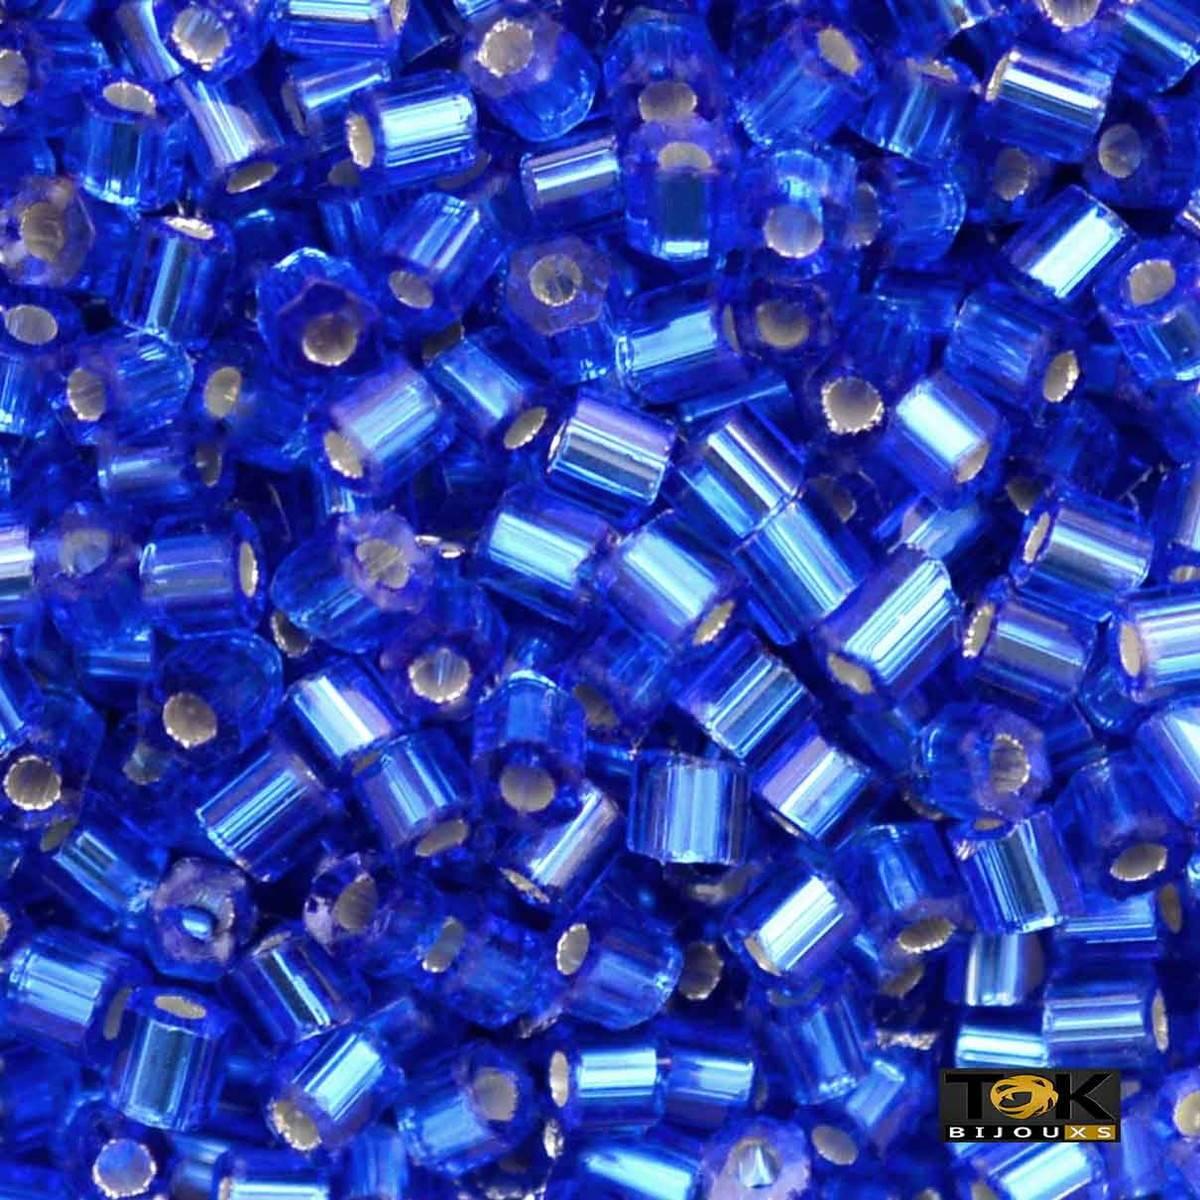 Vidrilho Jablonex - Azul Royal Médio Transparente Ref.37050 - 25g